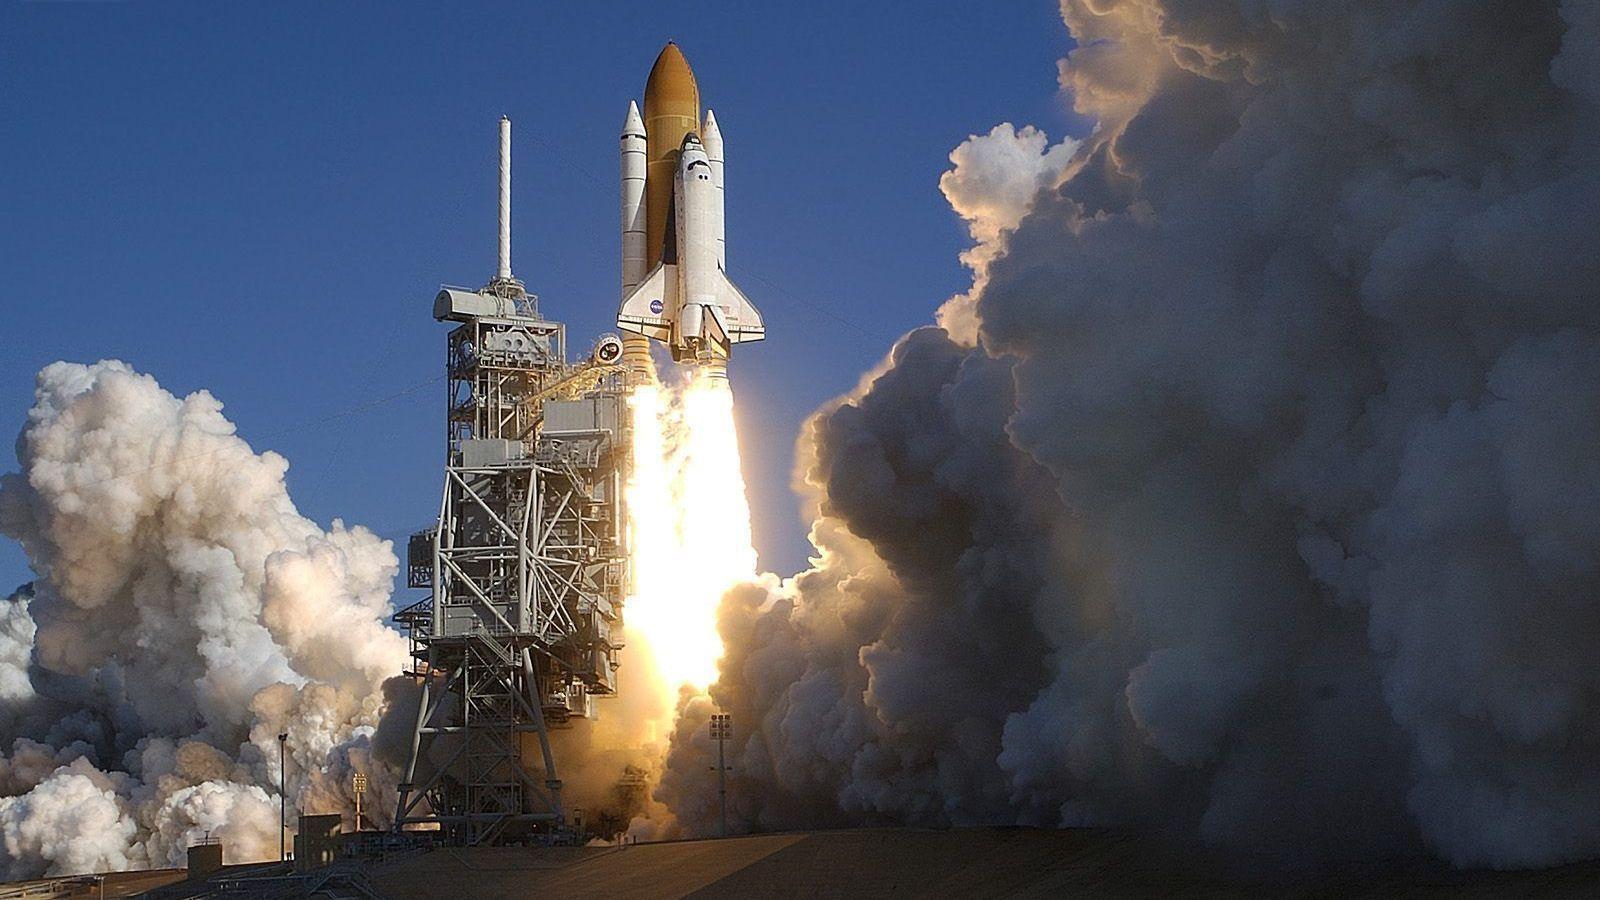 space shuttle columbia wallpaper - photo #3